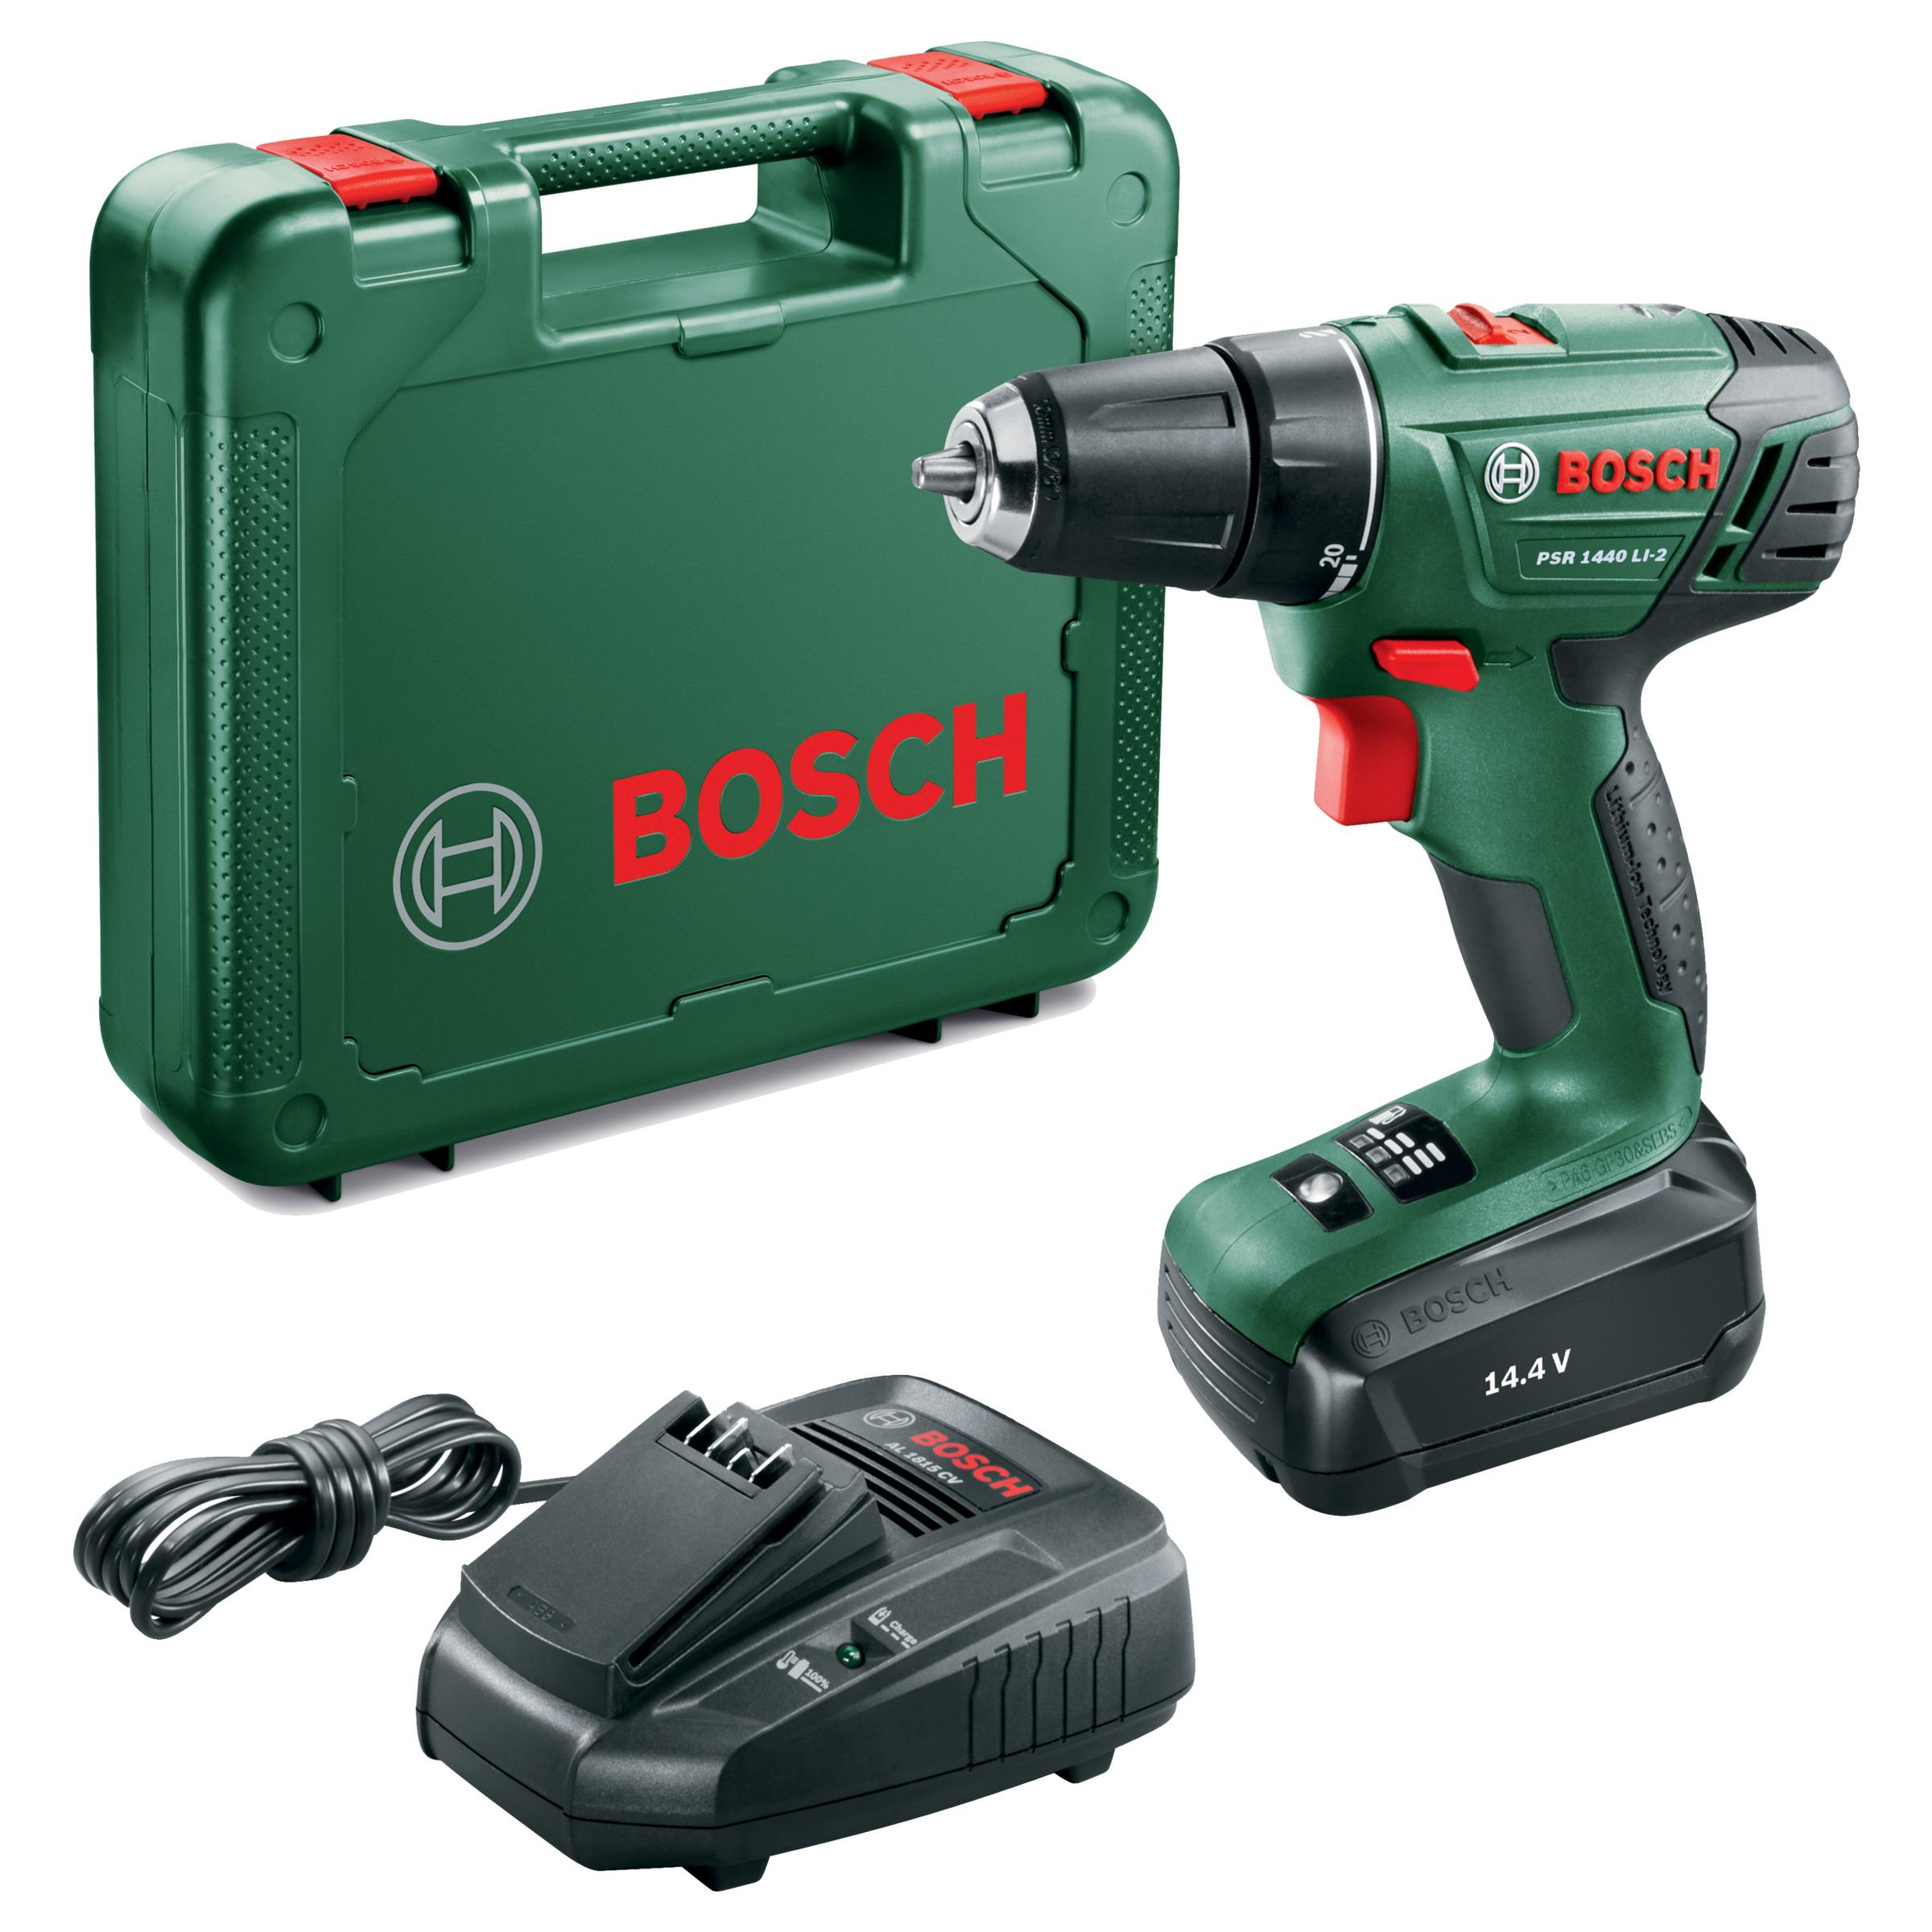 Bosch accuboormachine PSR1440 LI-2